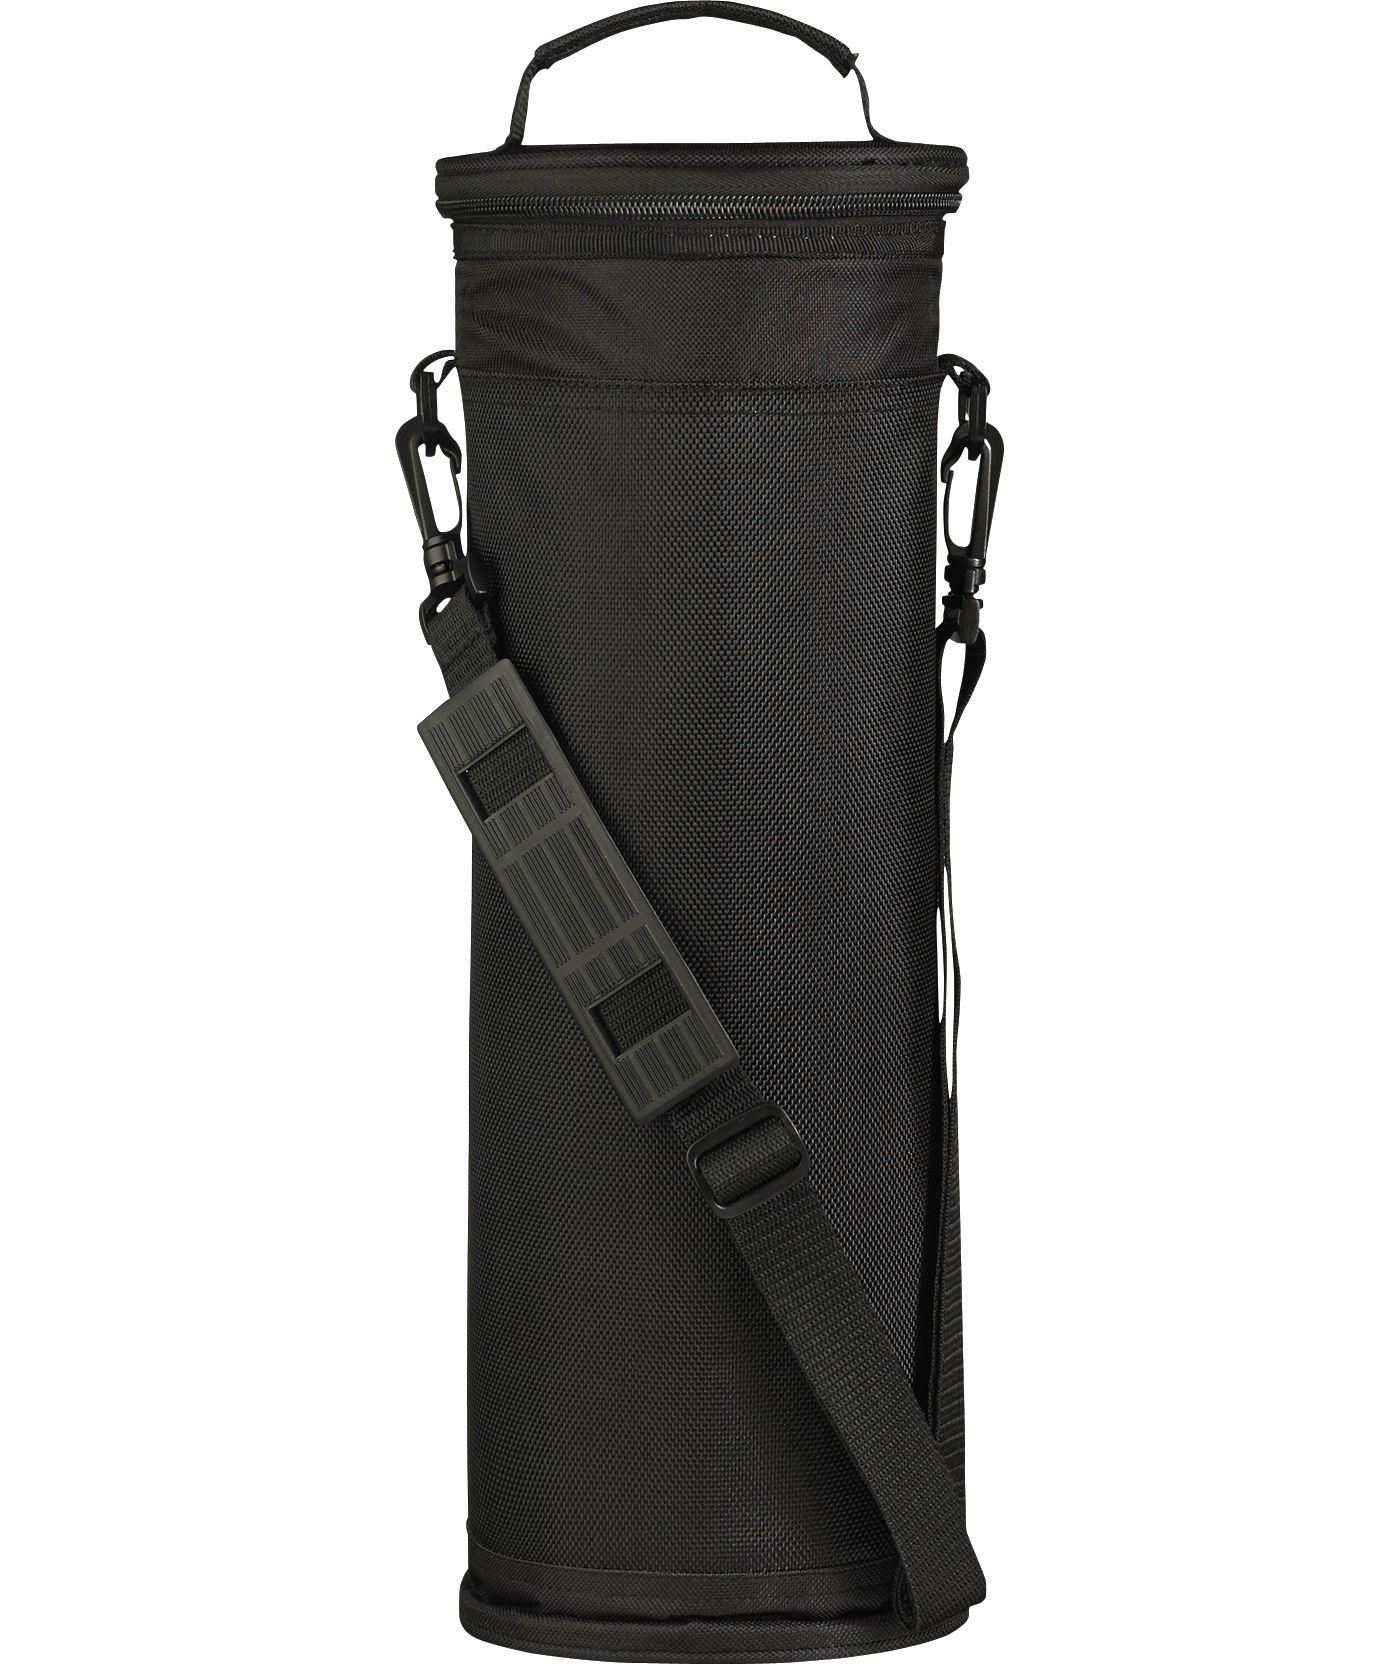 Maxfli 6-Can Cooler Bag